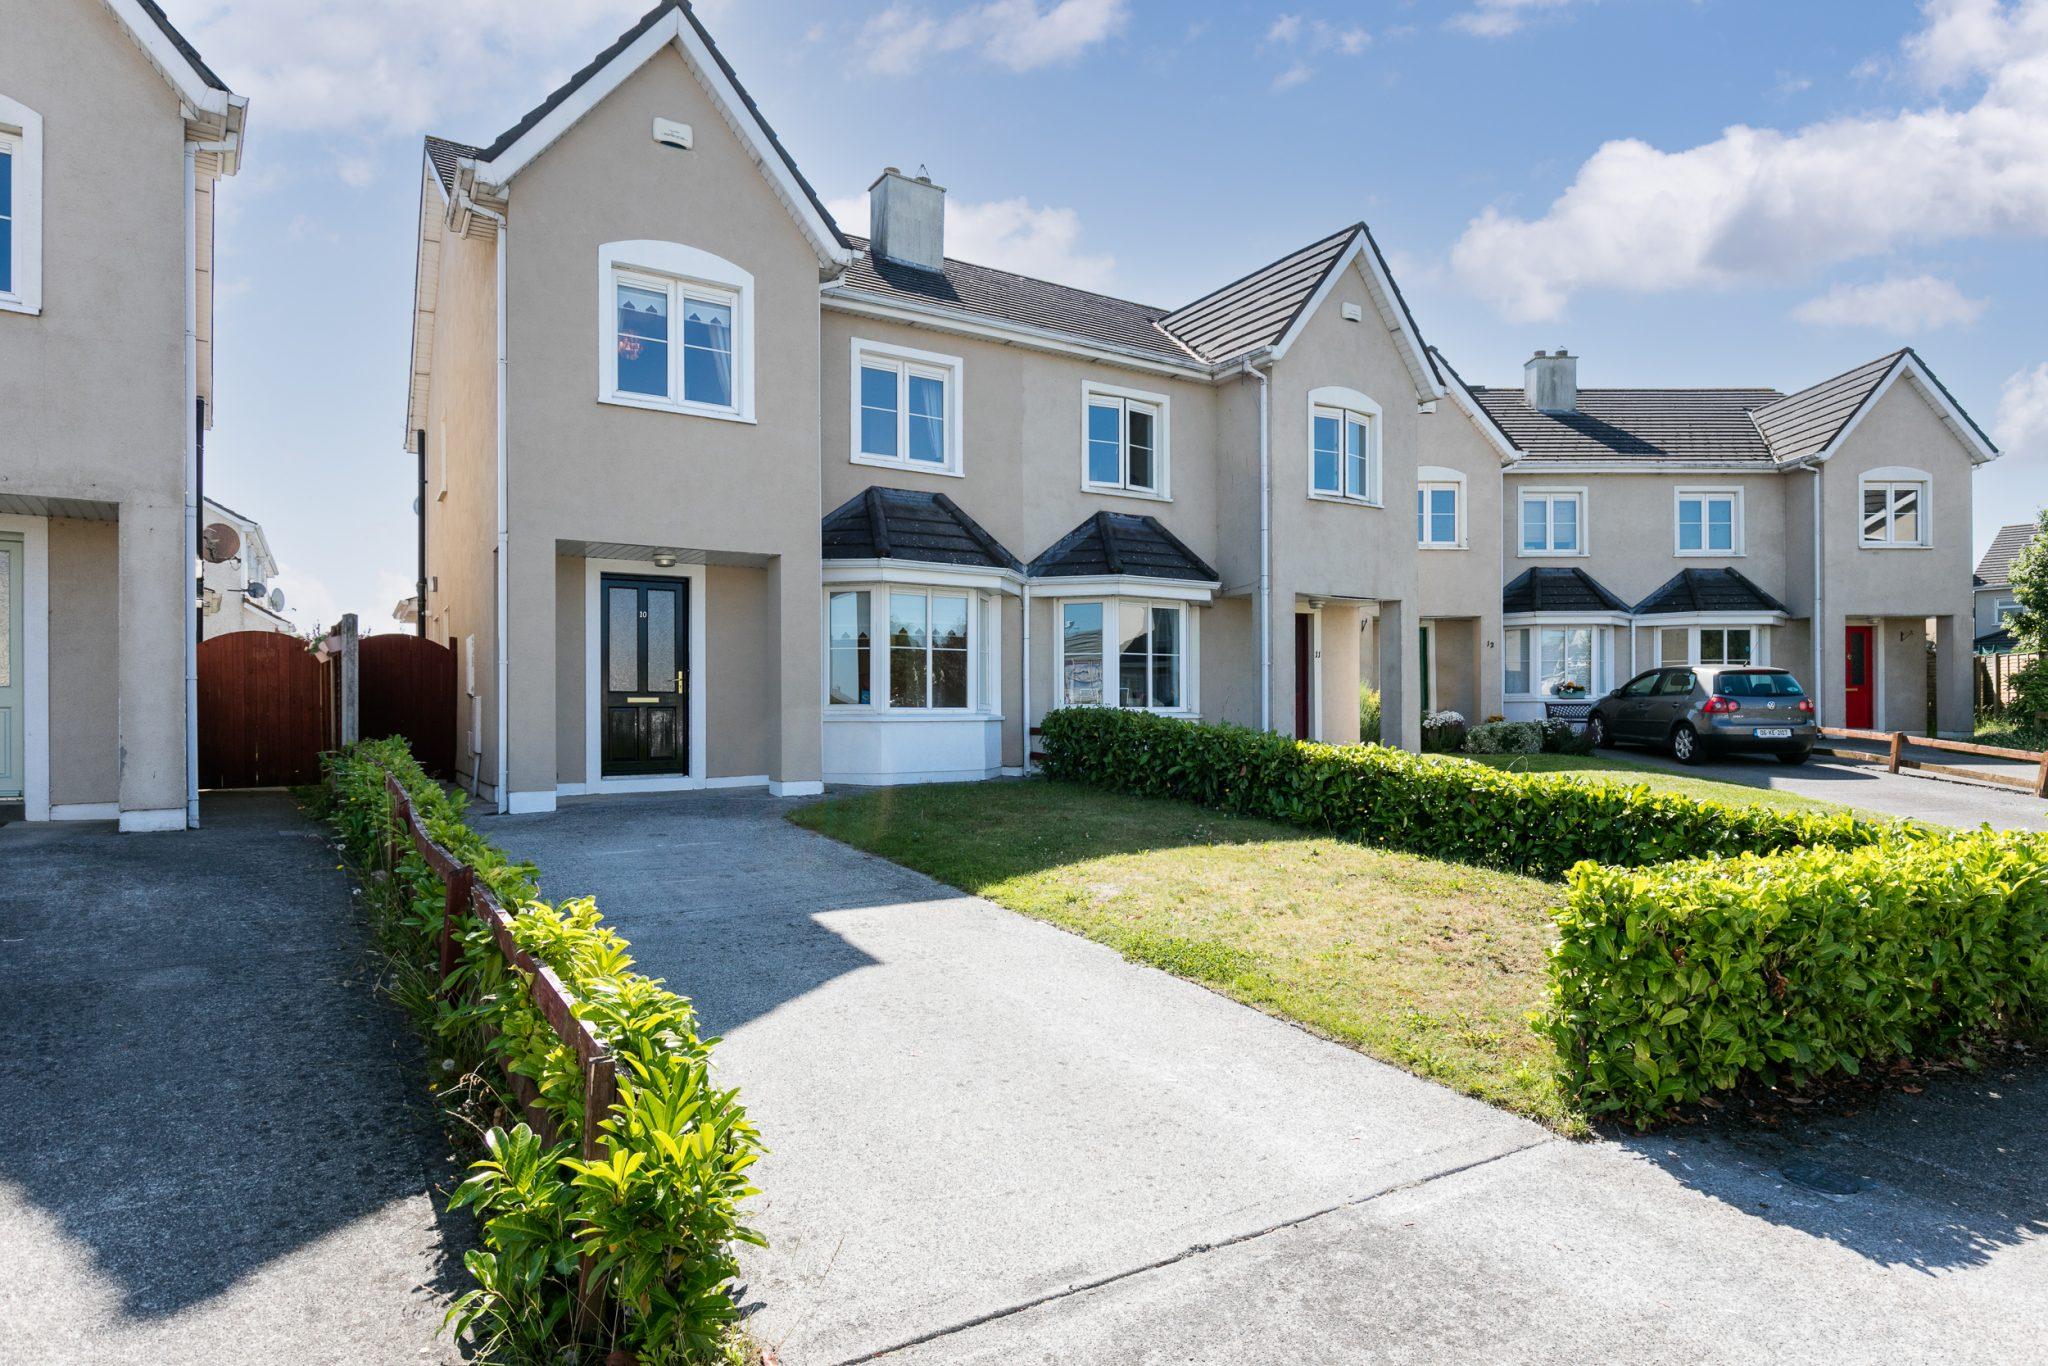 10 Sandhills, Hacketstown Road, Carlow Town, Co. Carlow R93 R9P4